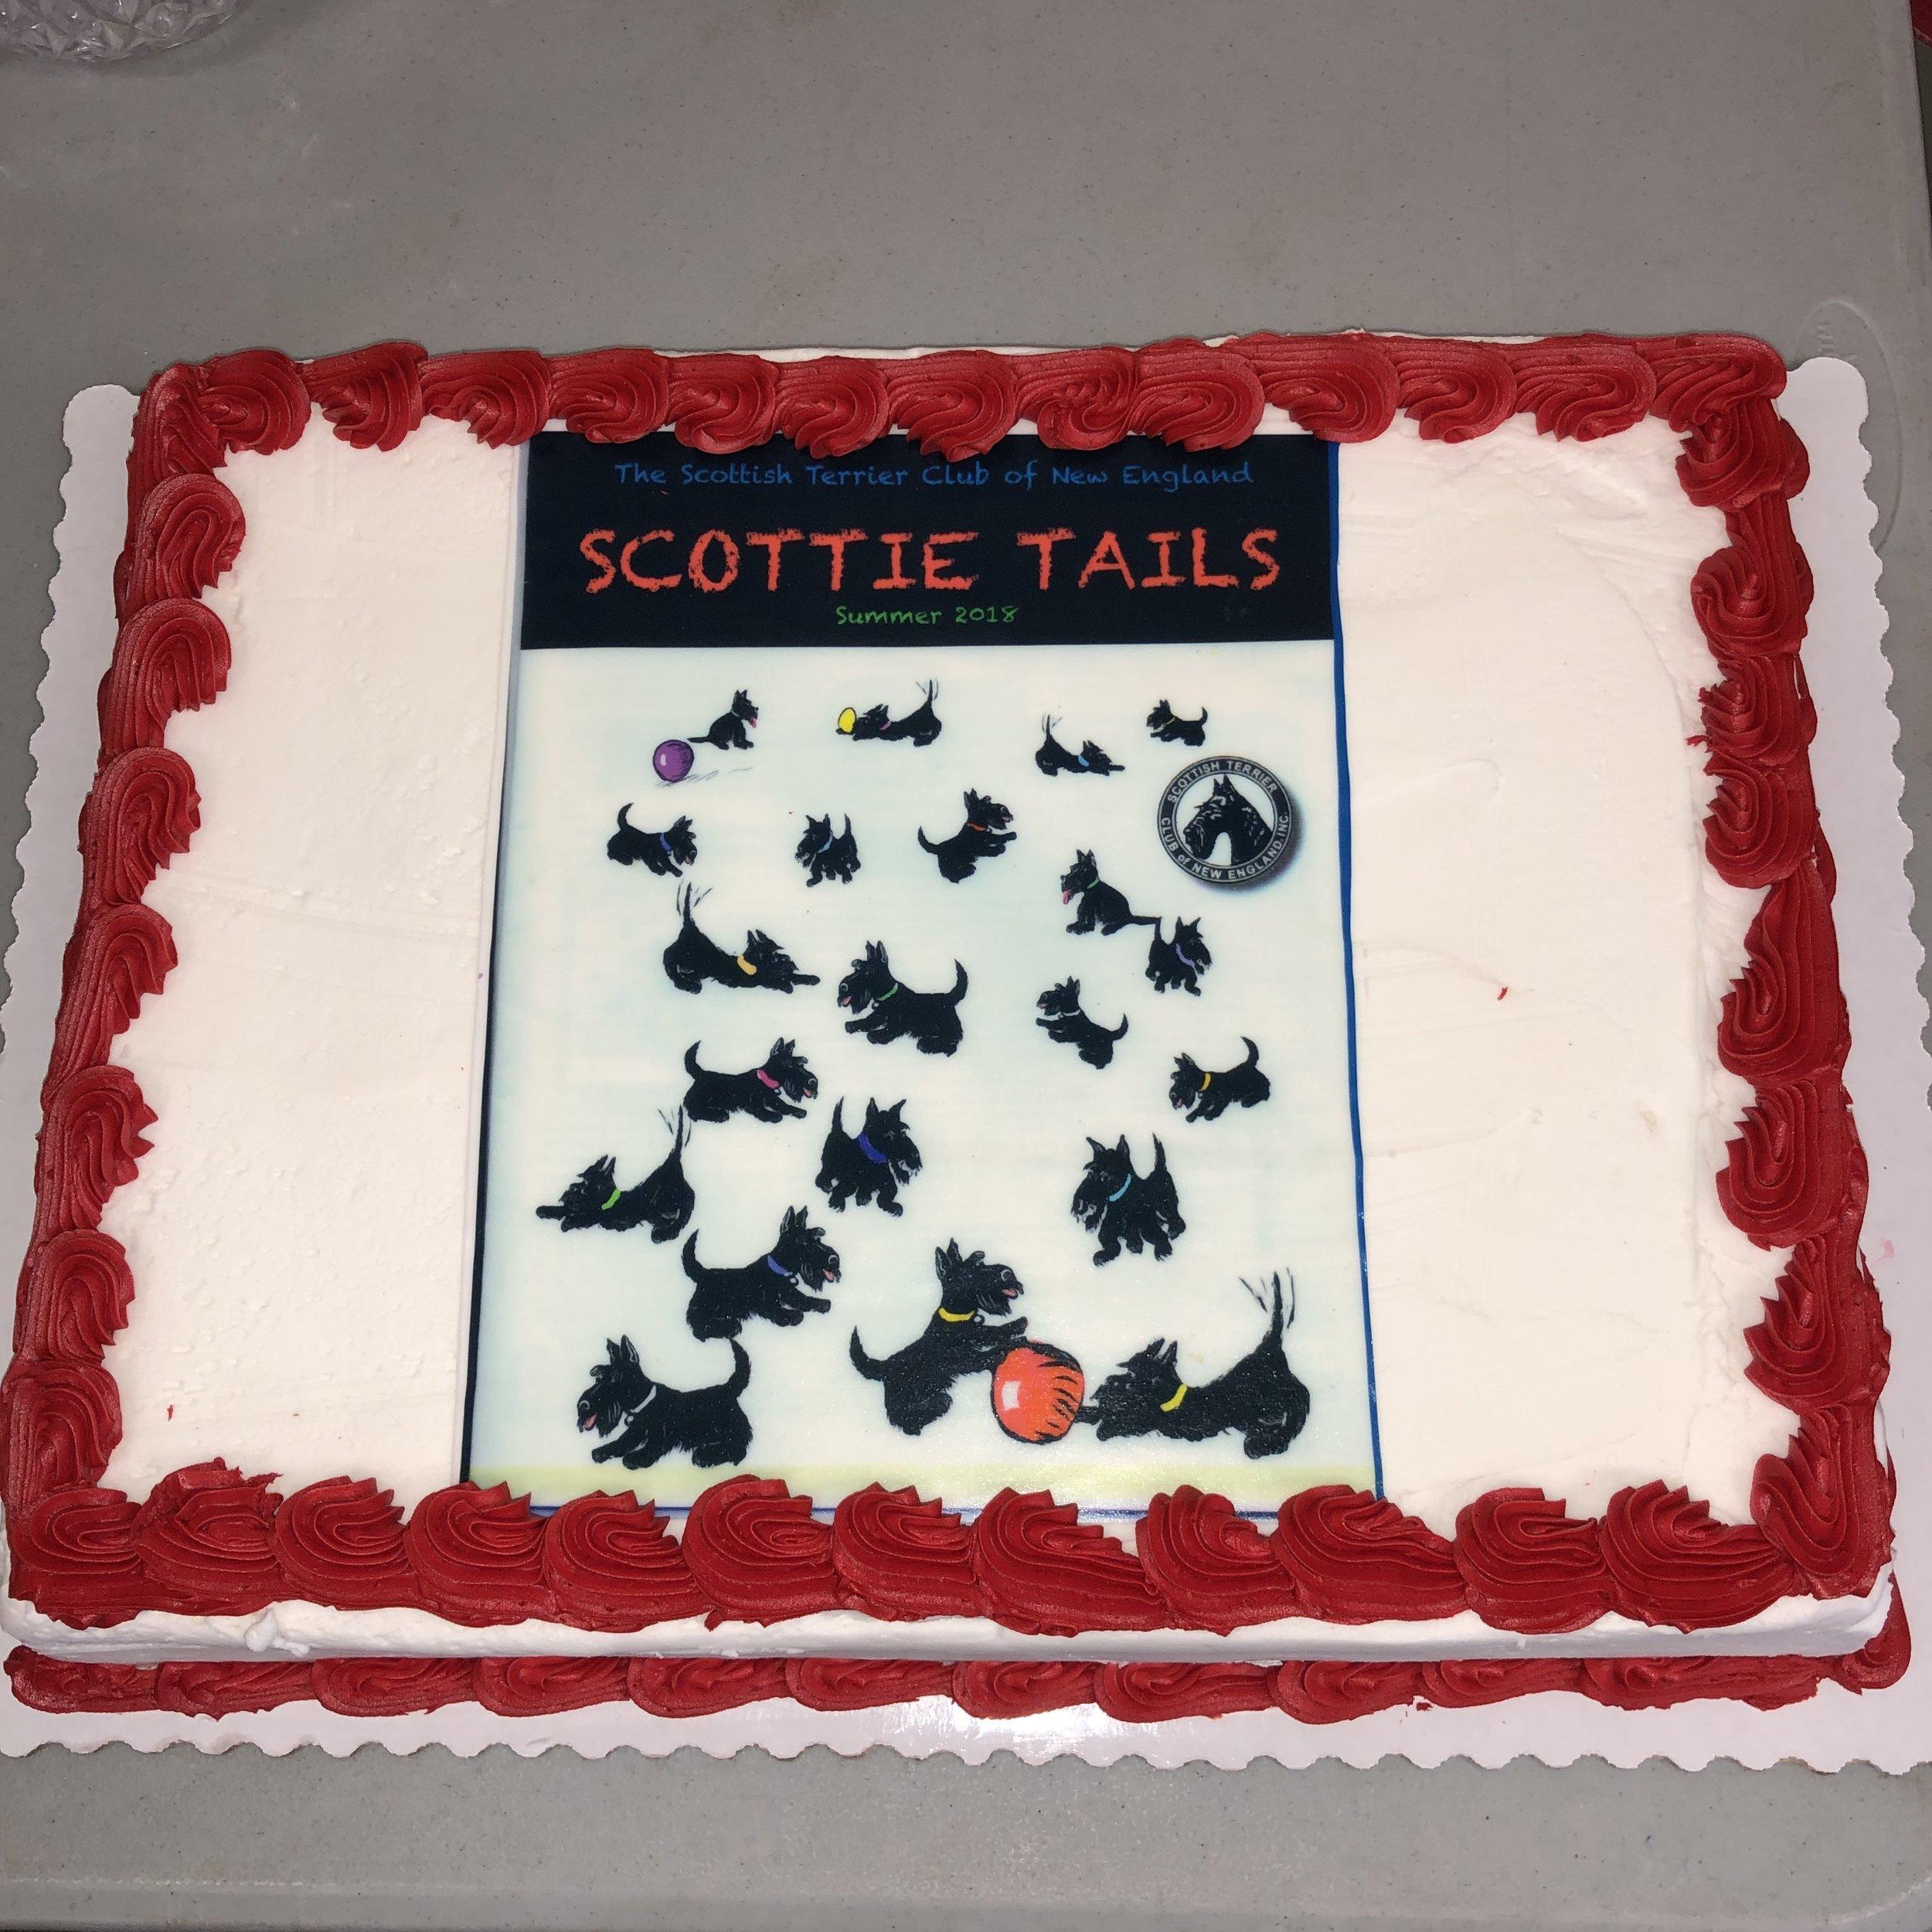 Scottie Tails cake